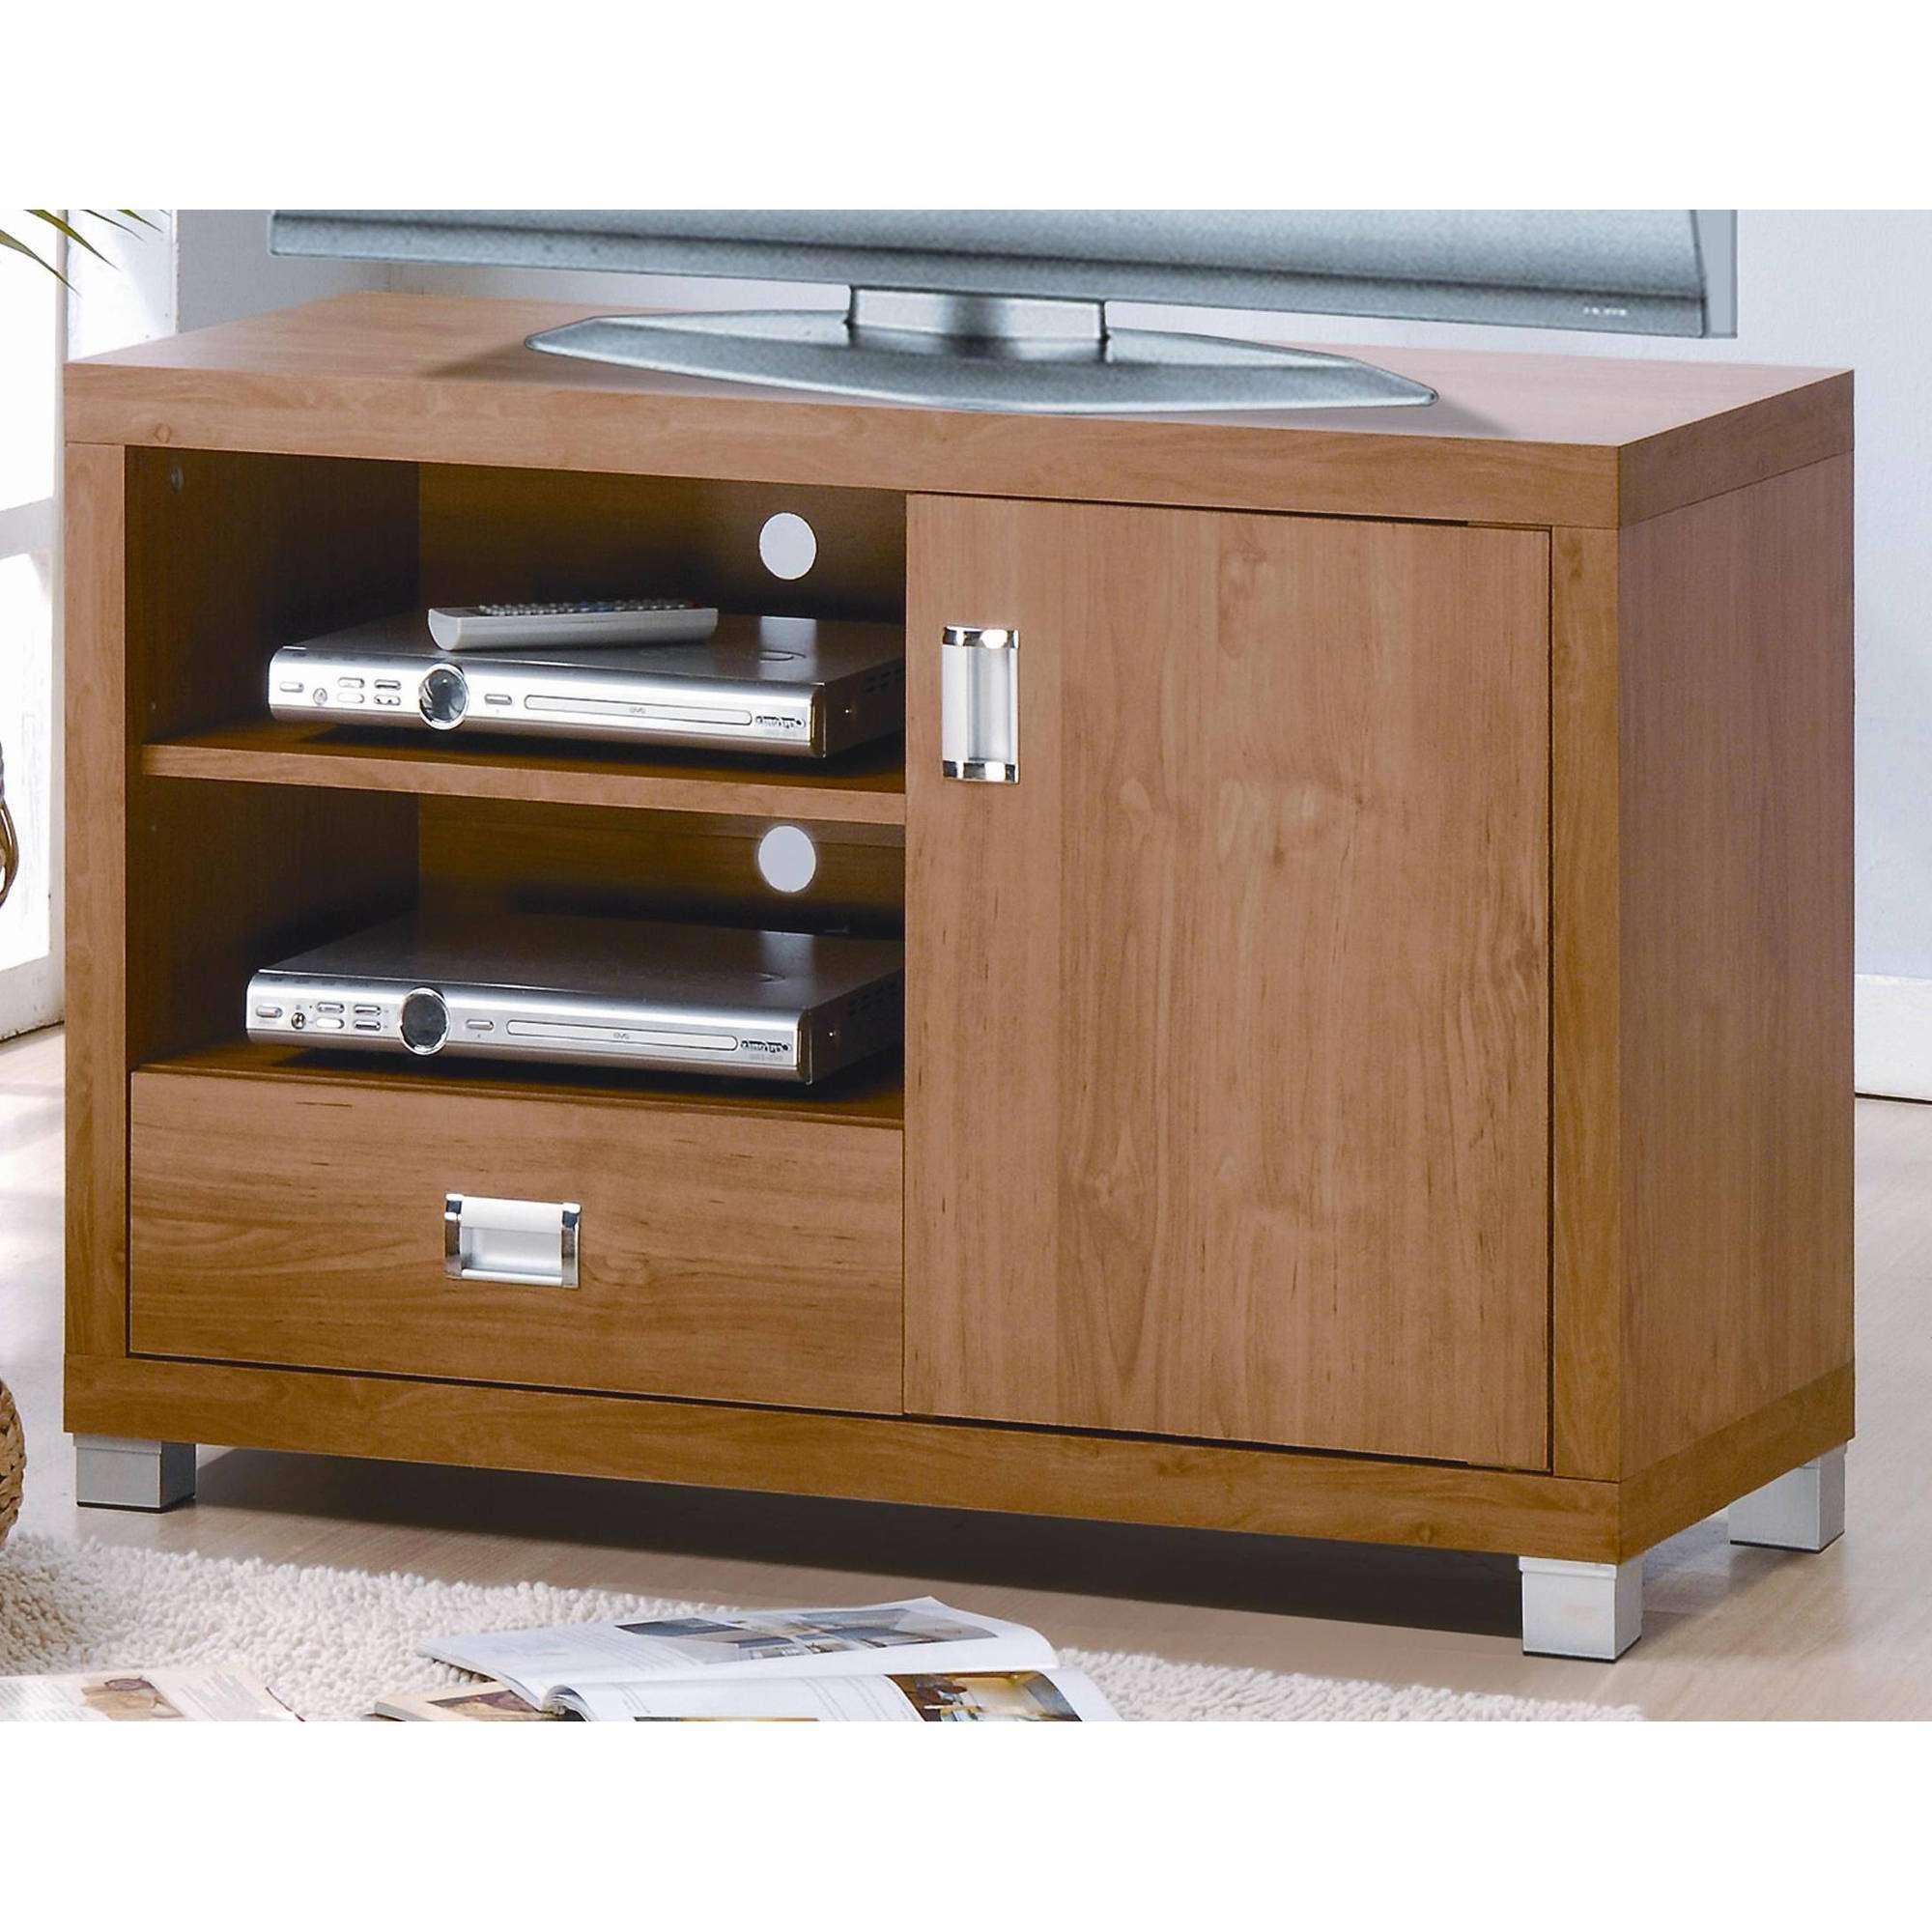 Techni Mobili Tv Cabinet, Maple – Walmart For Maple Tv Cabinets (View 7 of 20)